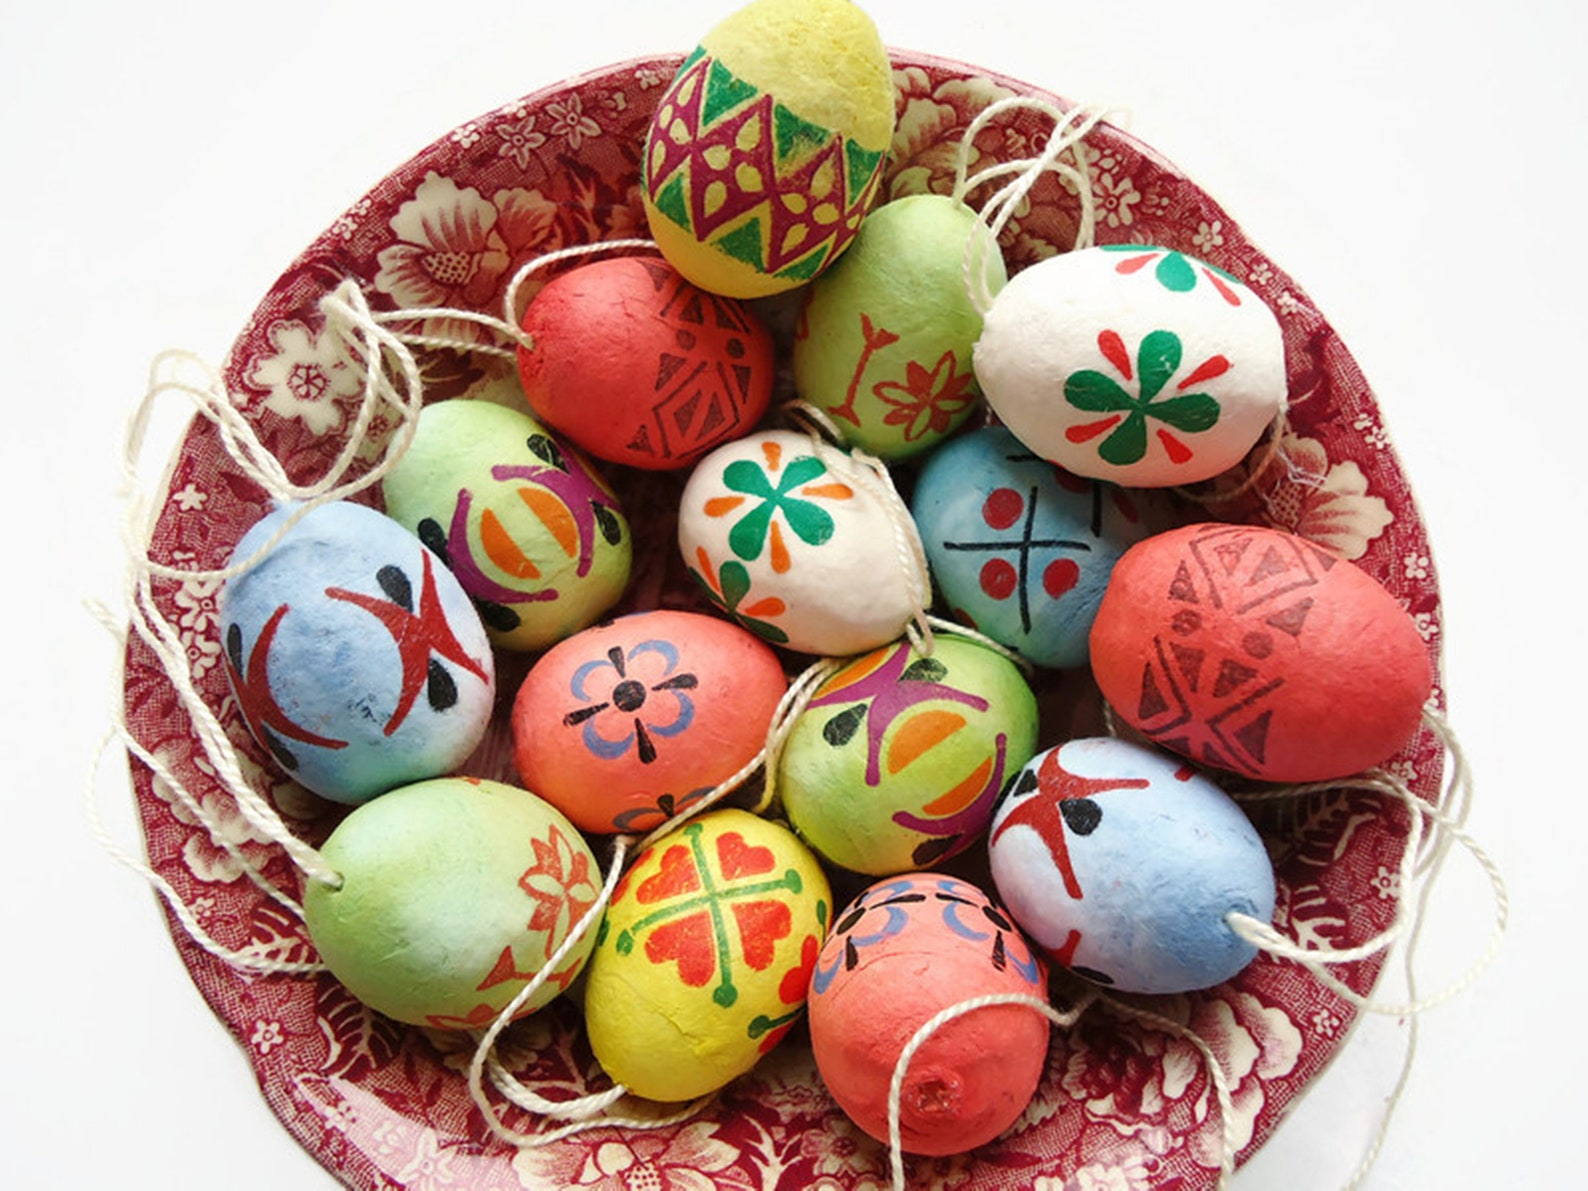 Set of 15 p. Colorful Vintage DDR Erzgebirge Handmade Cotton Spun Egg Ornaments